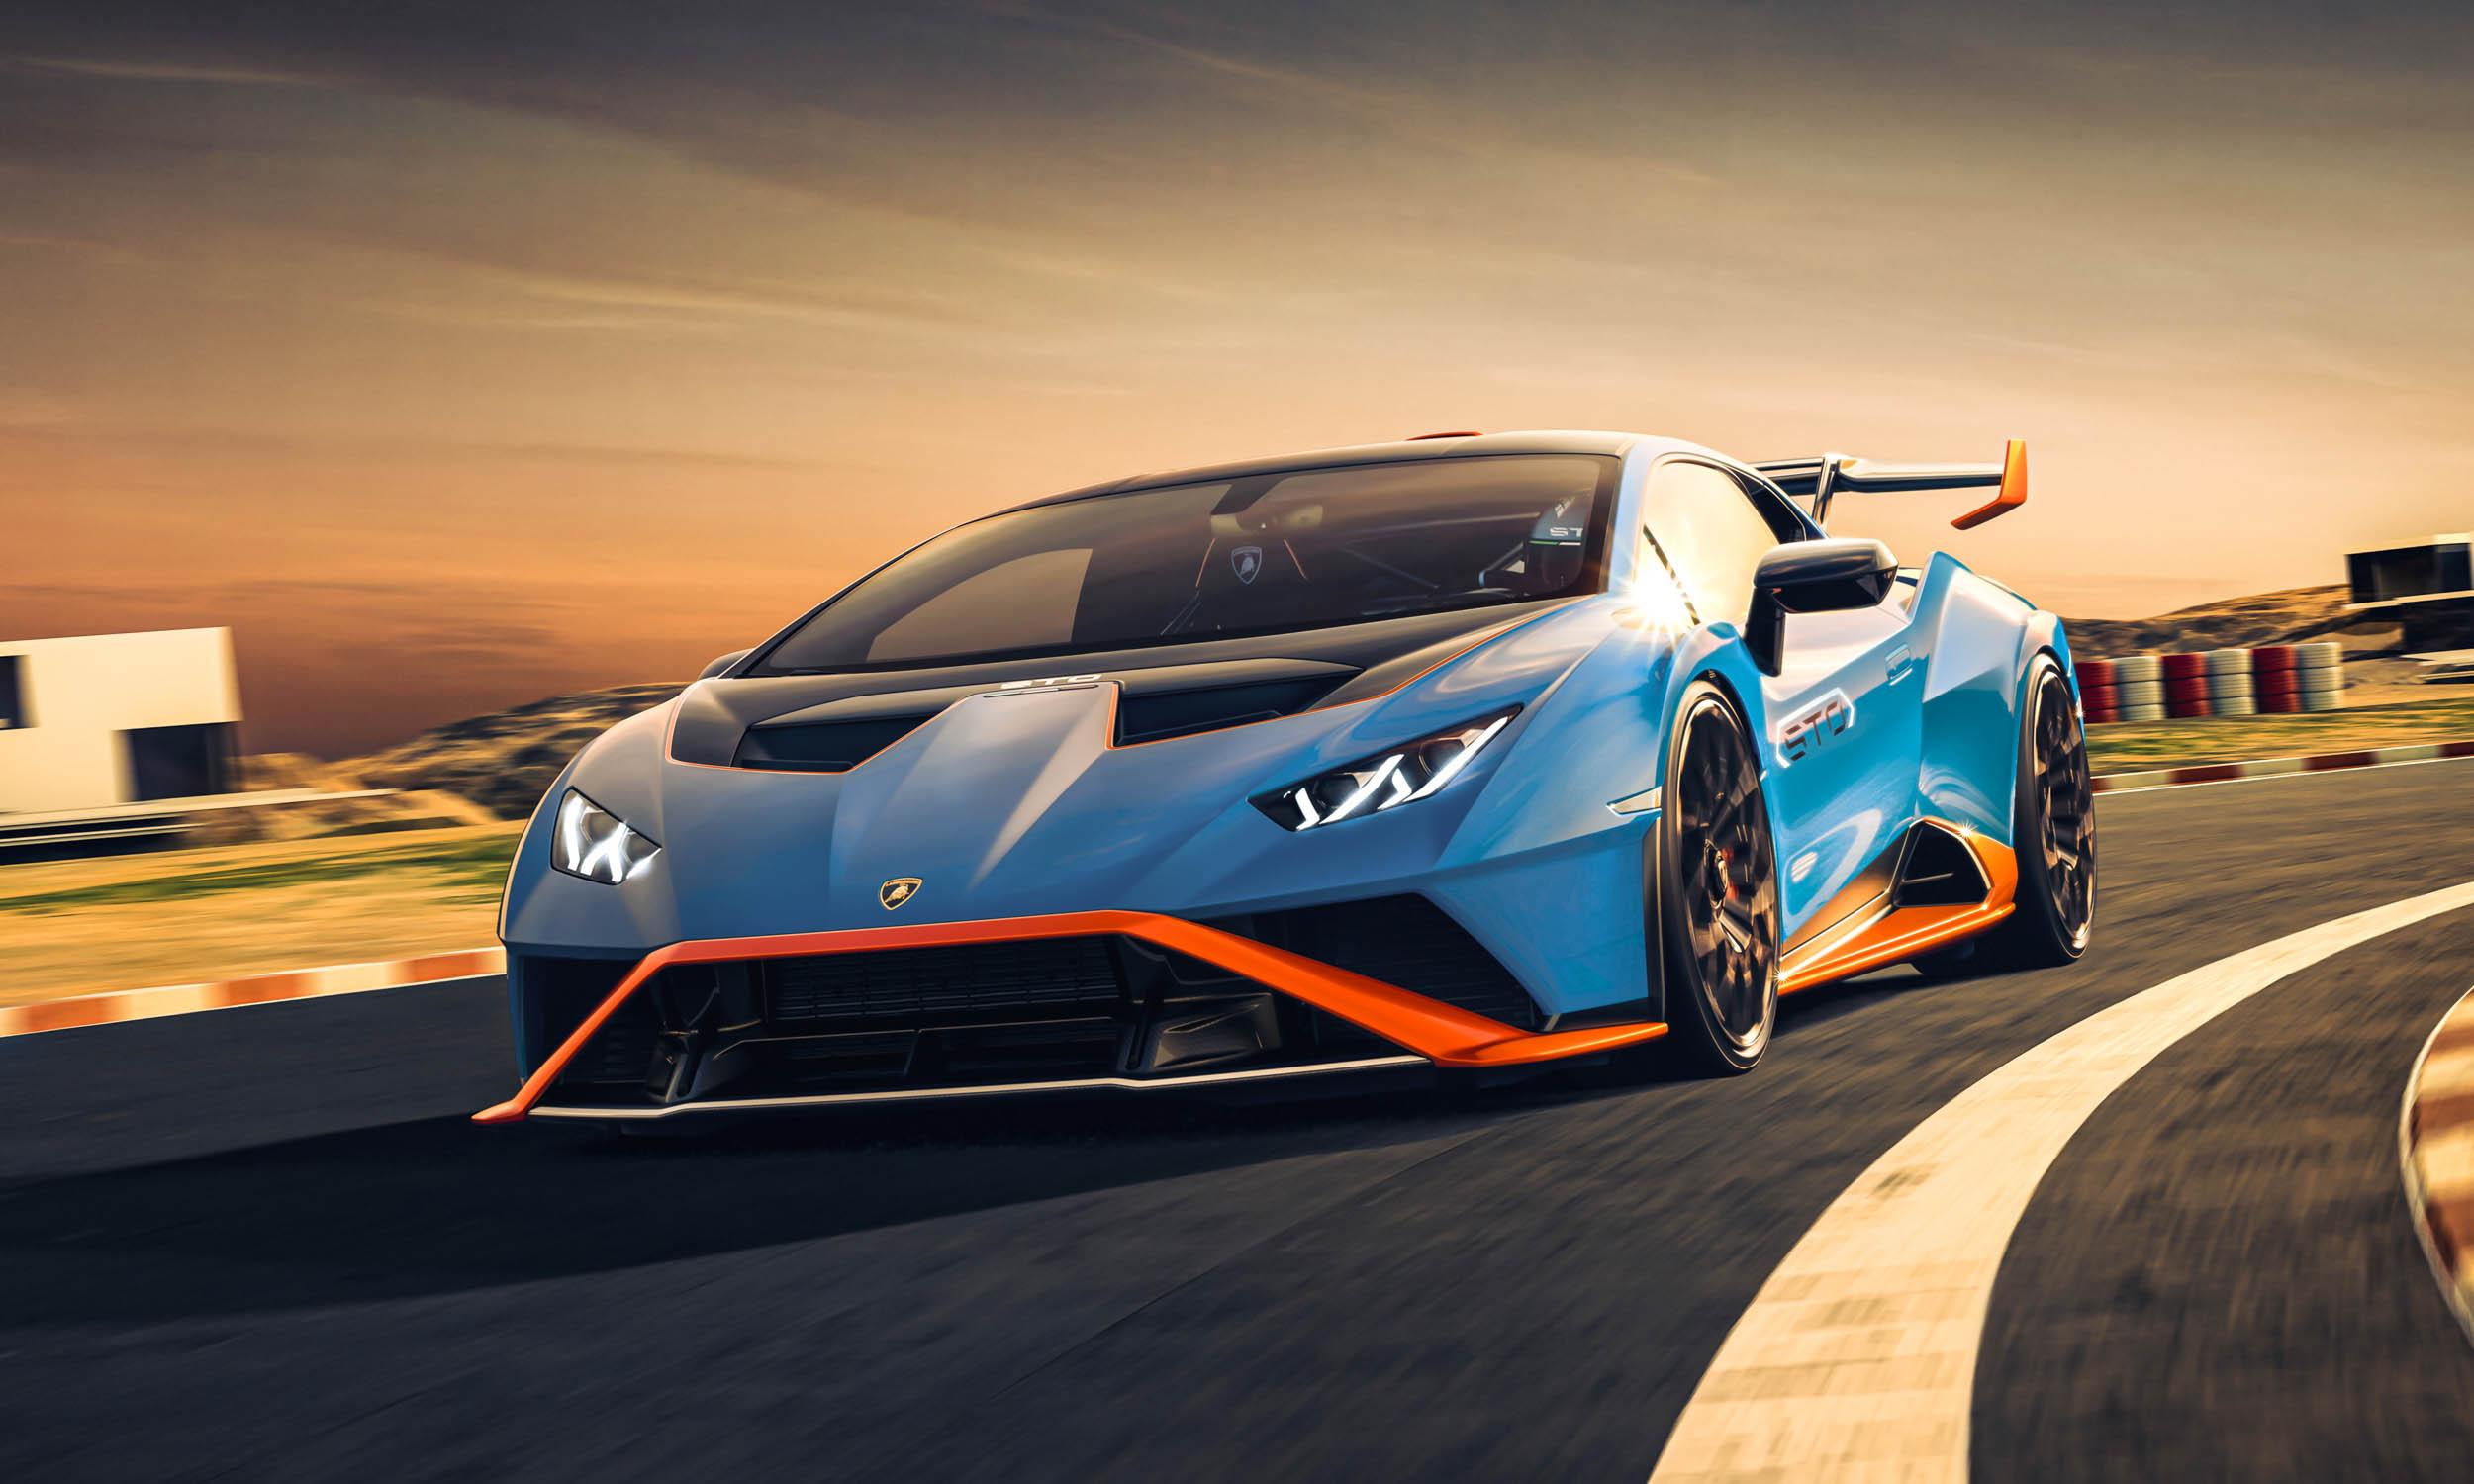 Lamborghini Huracan STO: Track Ready, Street Legal